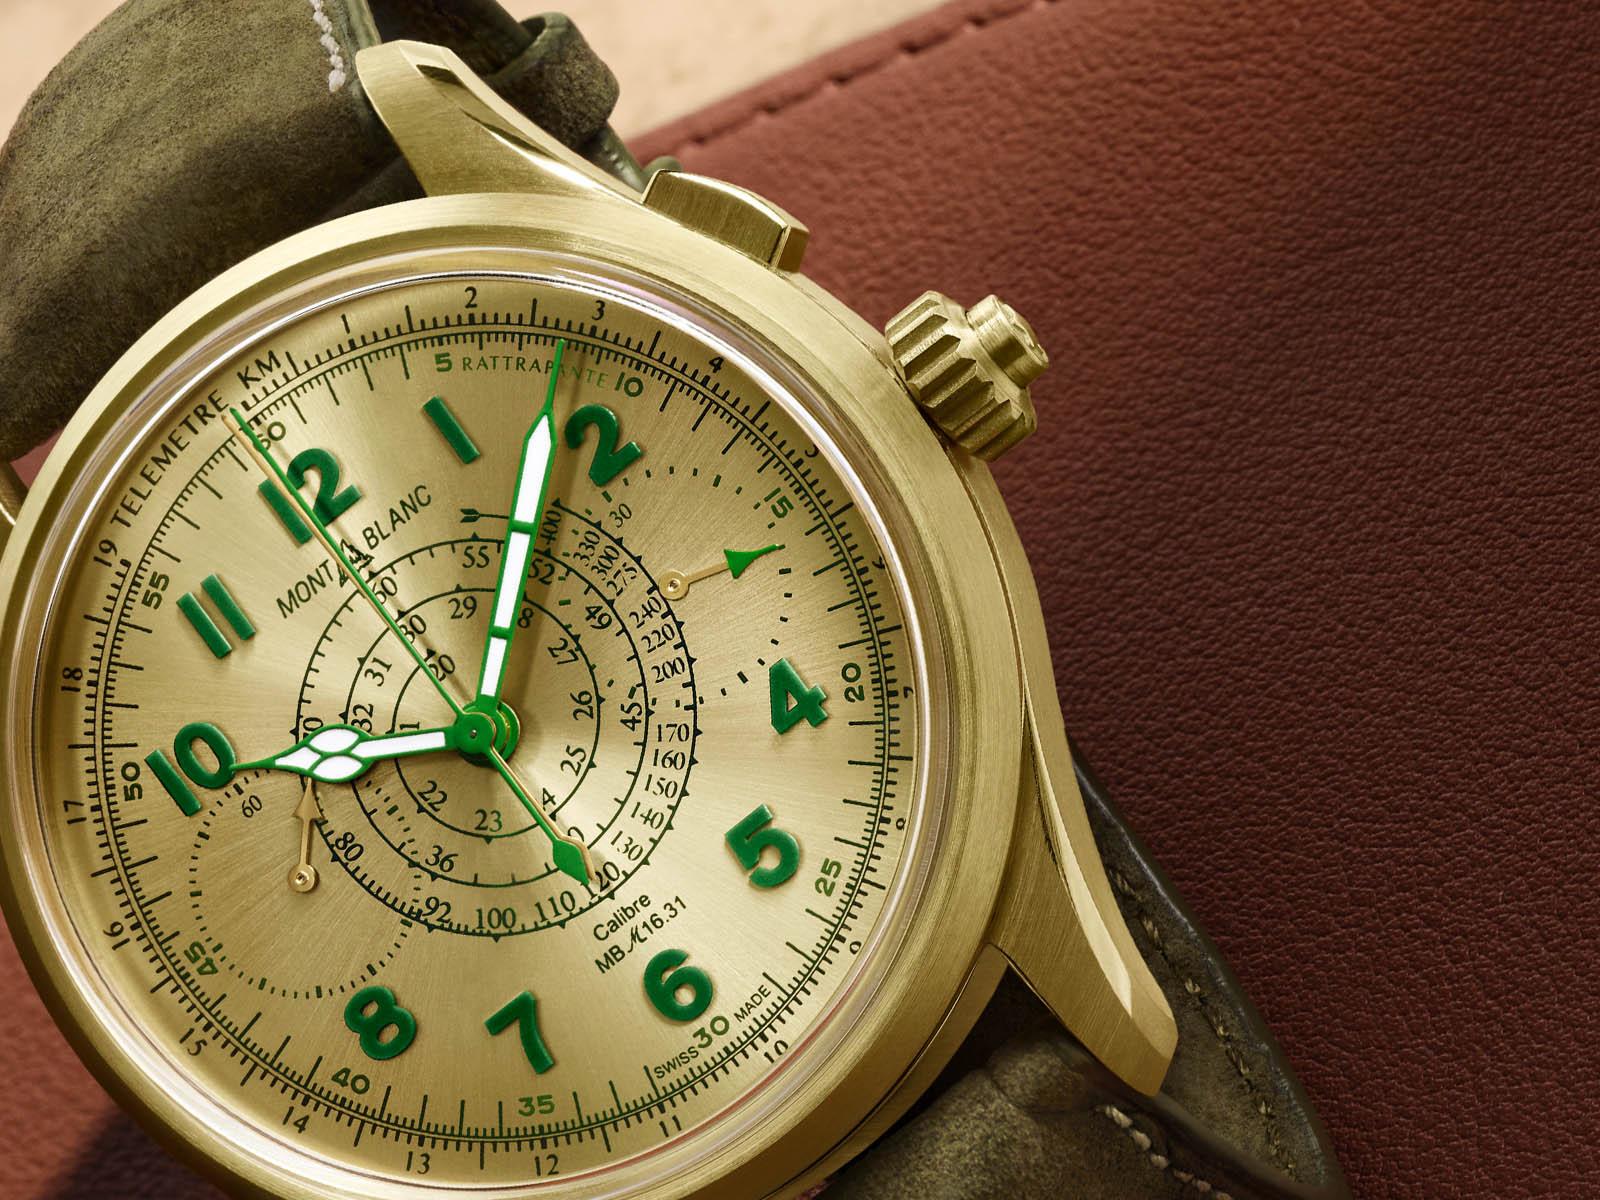 128085-montblanc-1858-split-second-chronograph-limited-edition-18-2.jpg